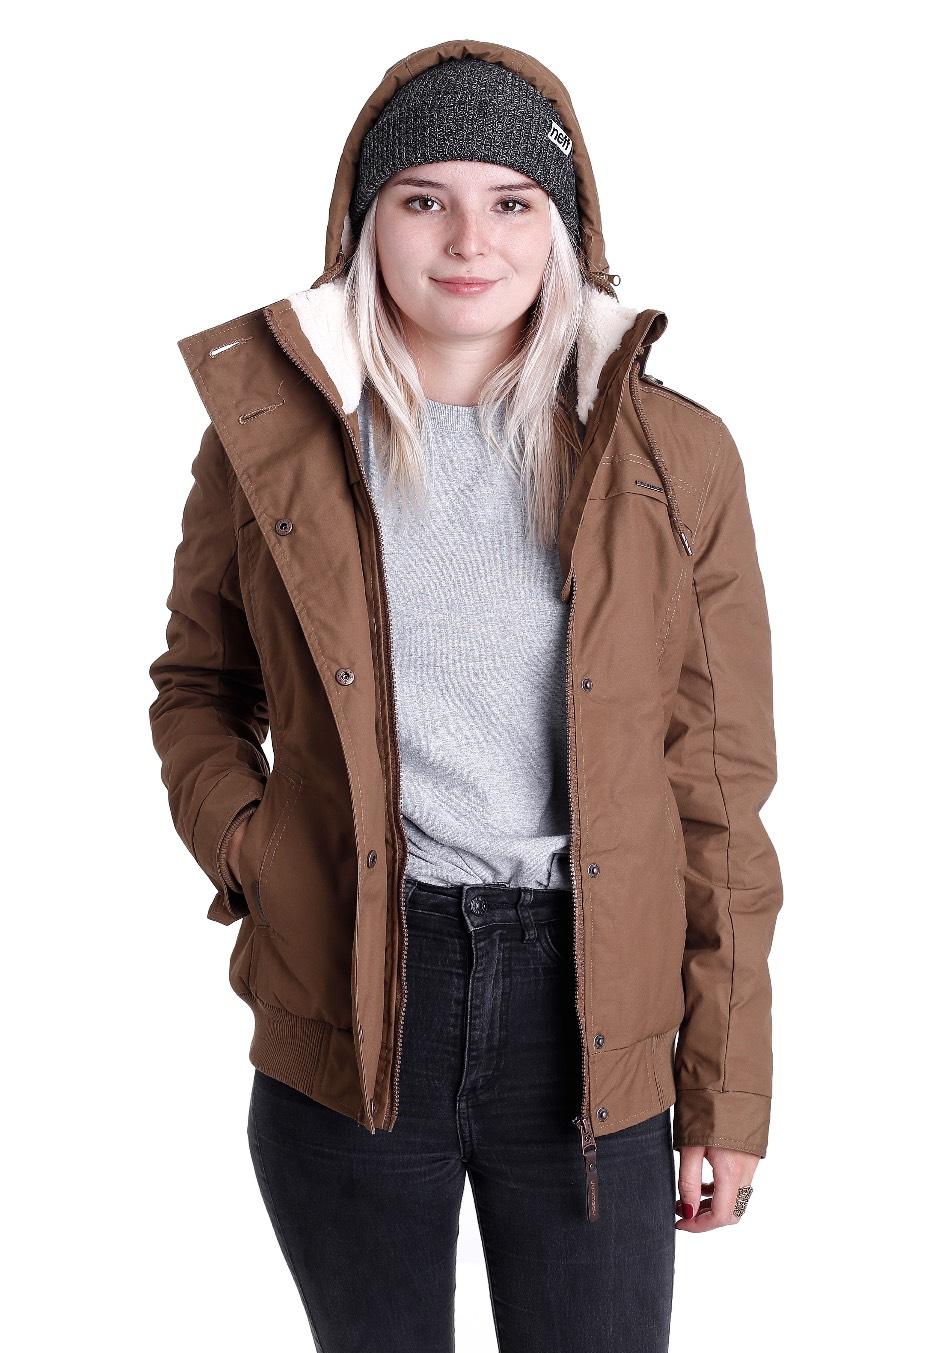 Cinnamon Ewok Cinnamon Ragwear Jacket Ewok Ewok Jacket Ragwear Ragwear Cinnamon Ewok Jacket Ragwear wIpAqtnAS4